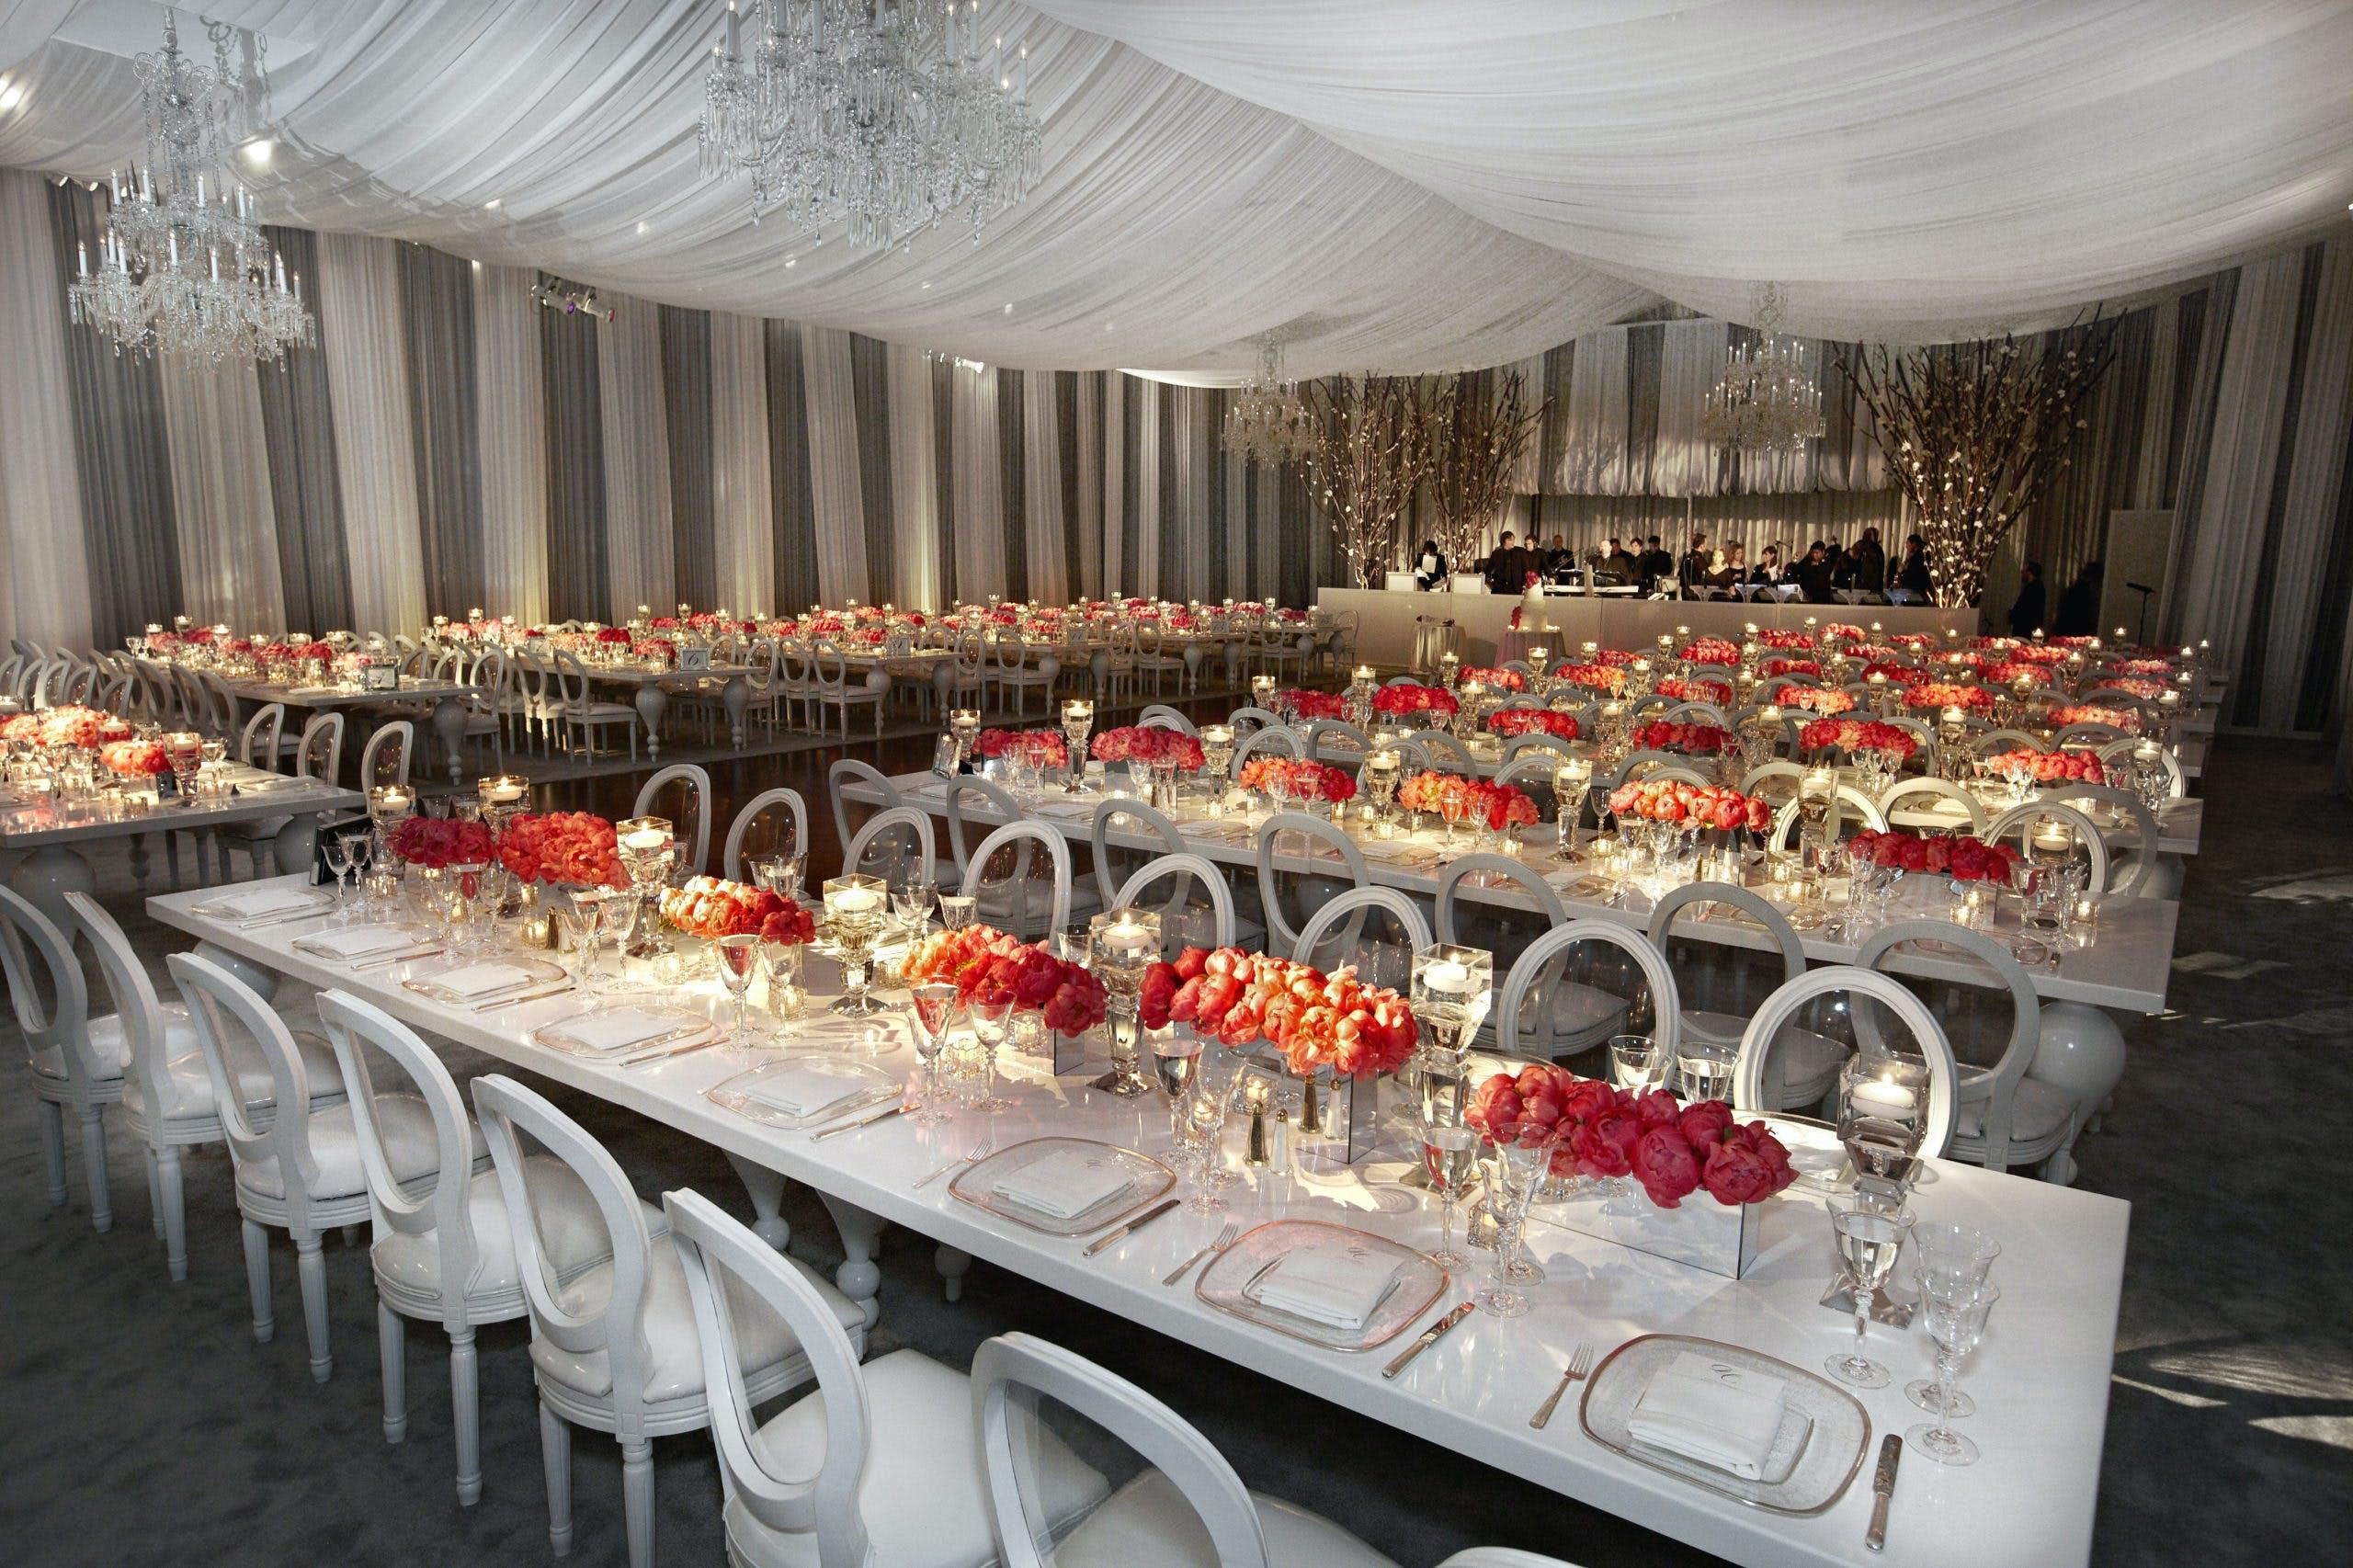 Tented reception venue with orange floral centerpieces l PartySlate